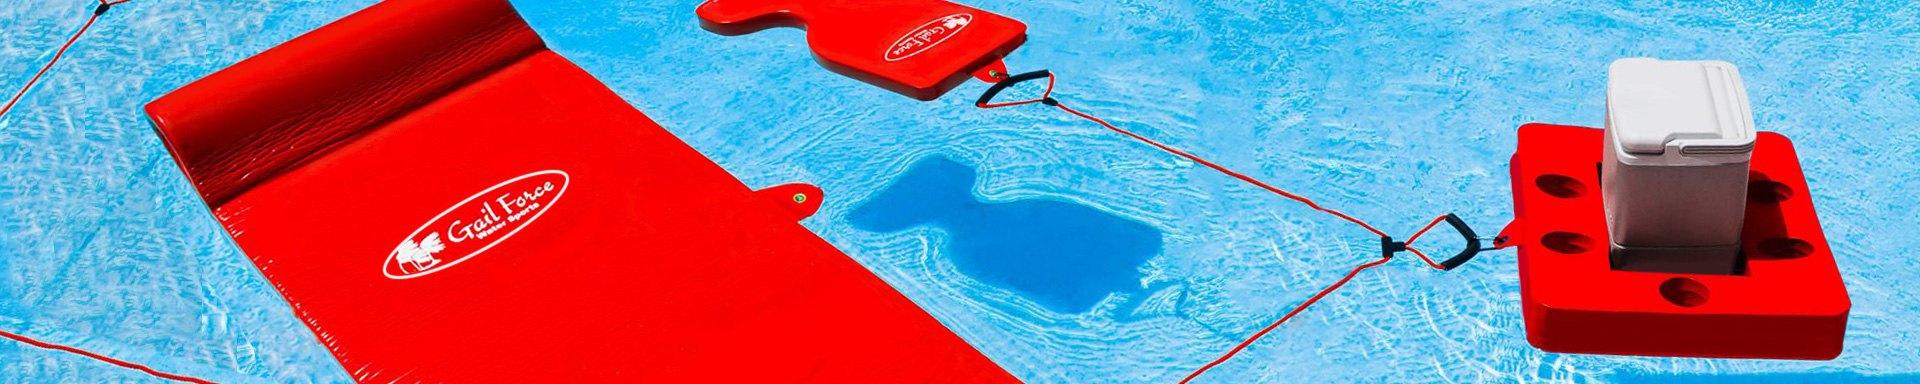 Gail Force Water Sports Saddle Float Orange